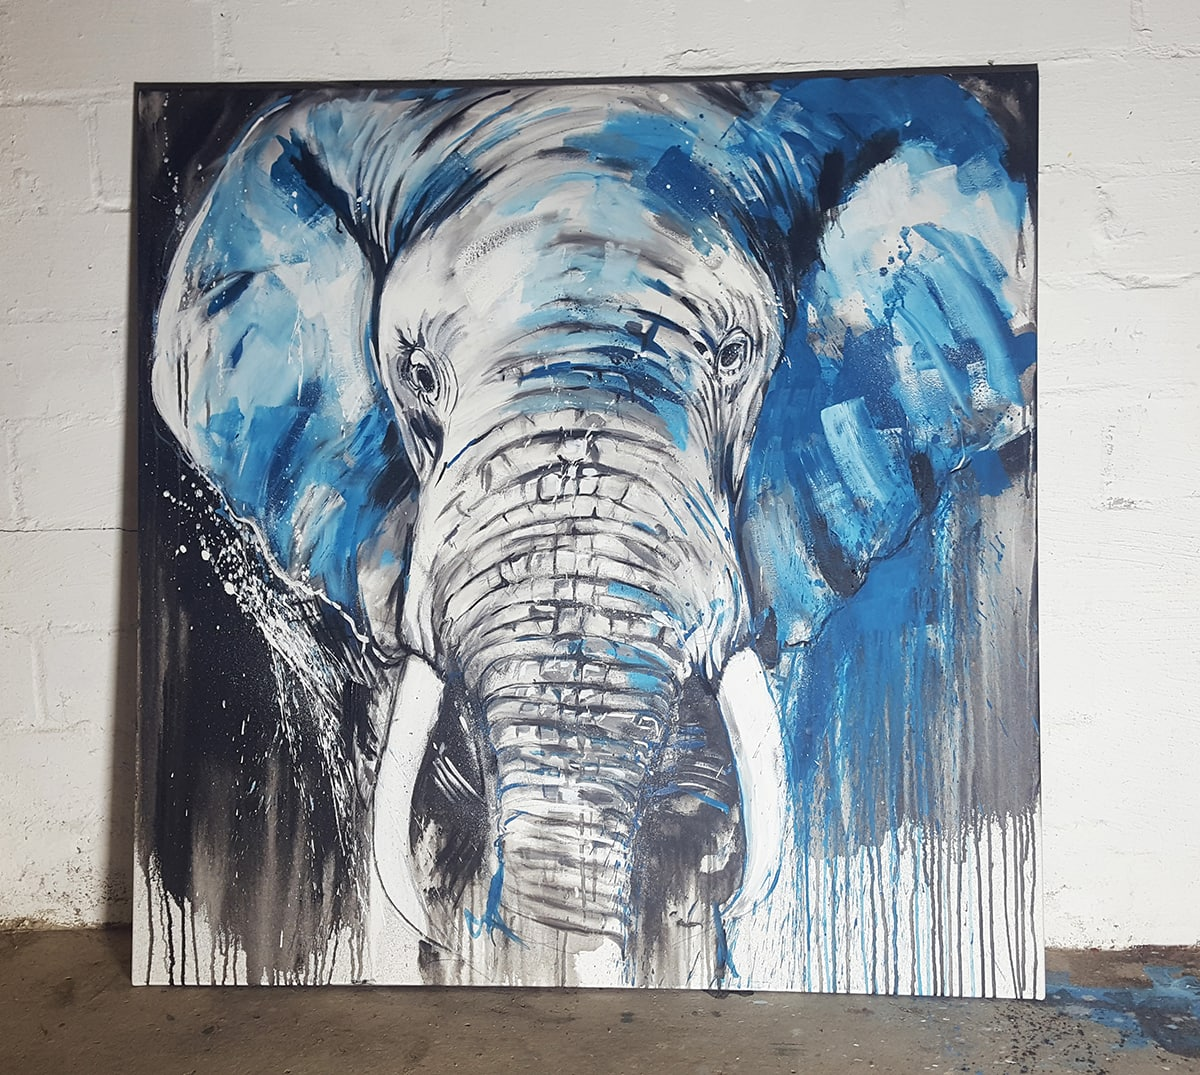 Unikat: Elefant #5, expressives Gemälde, Malerei von Stefanie Rogge, Motiv Elefant No 5